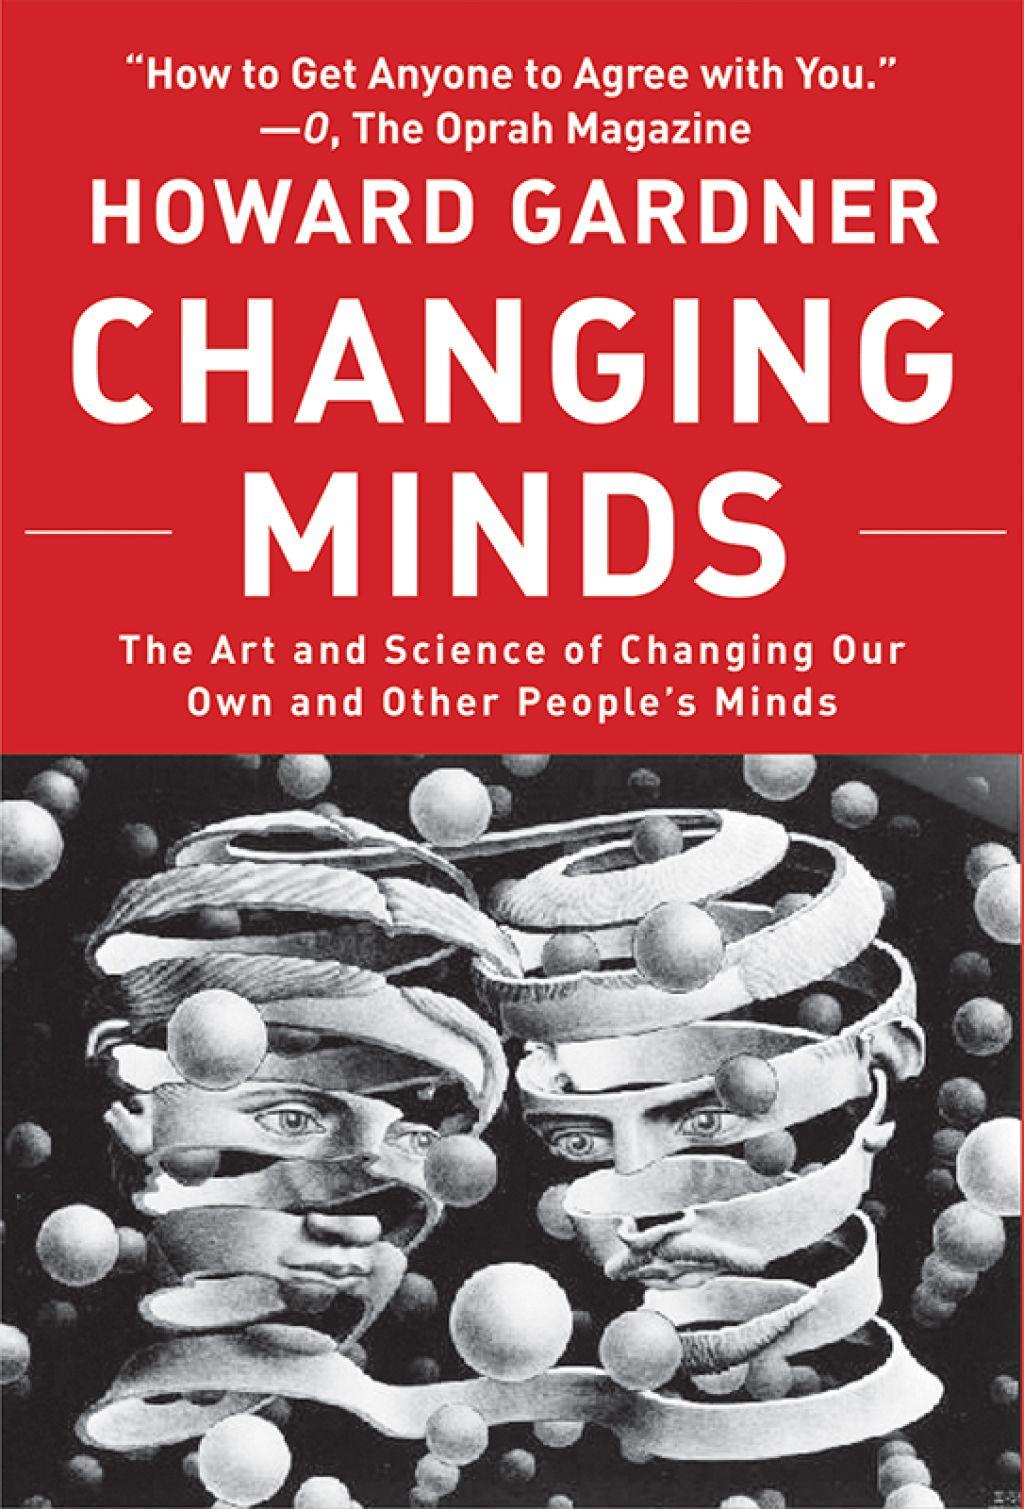 Changing minds ebook mindfulness science leadership